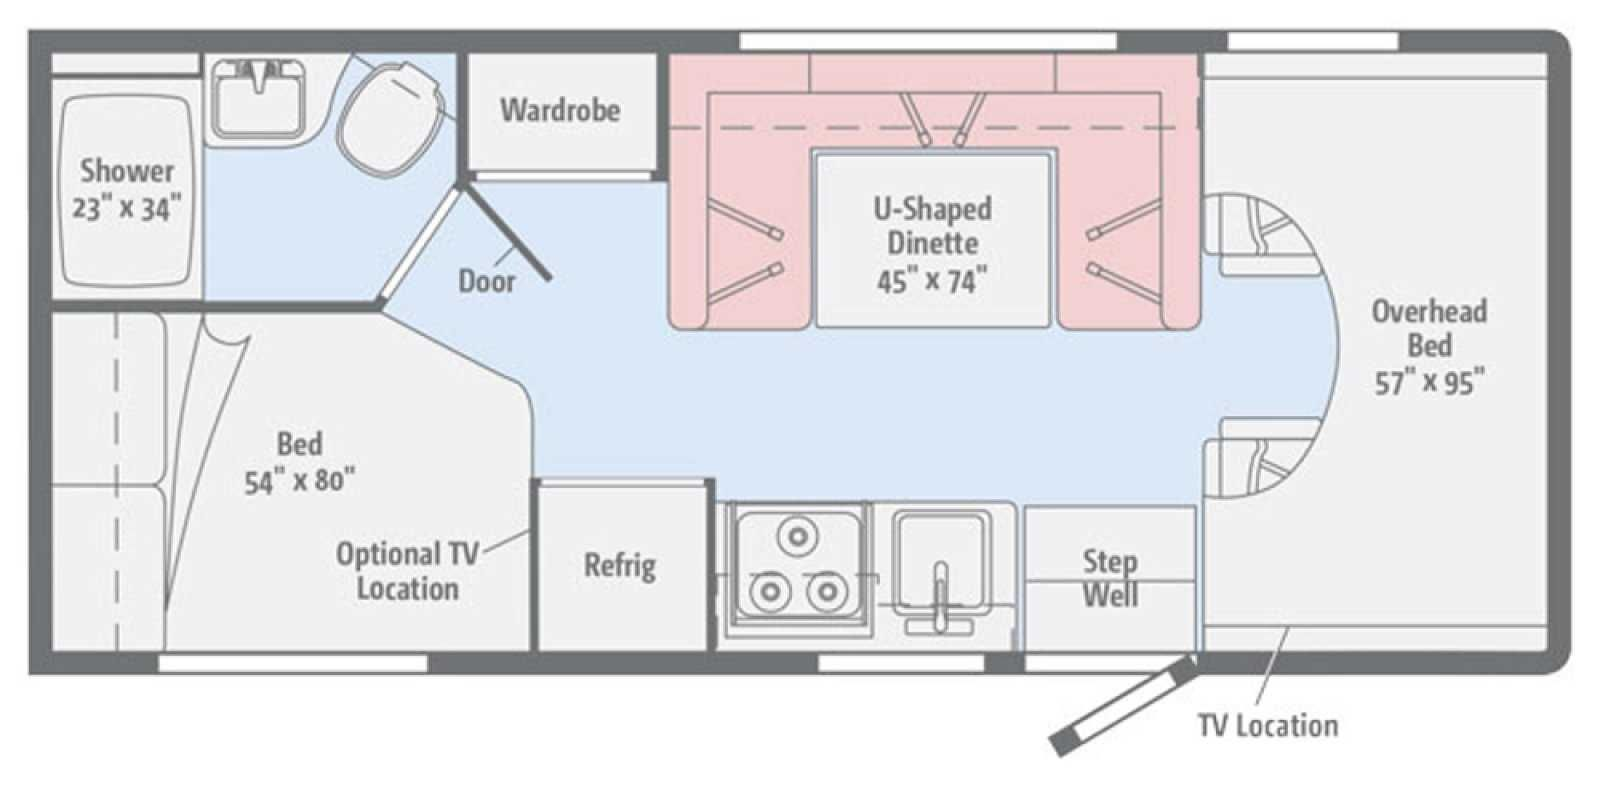 Thor Windsport 29m Camping World Hkr 1509796 Floor Plans How To Plan Flooring